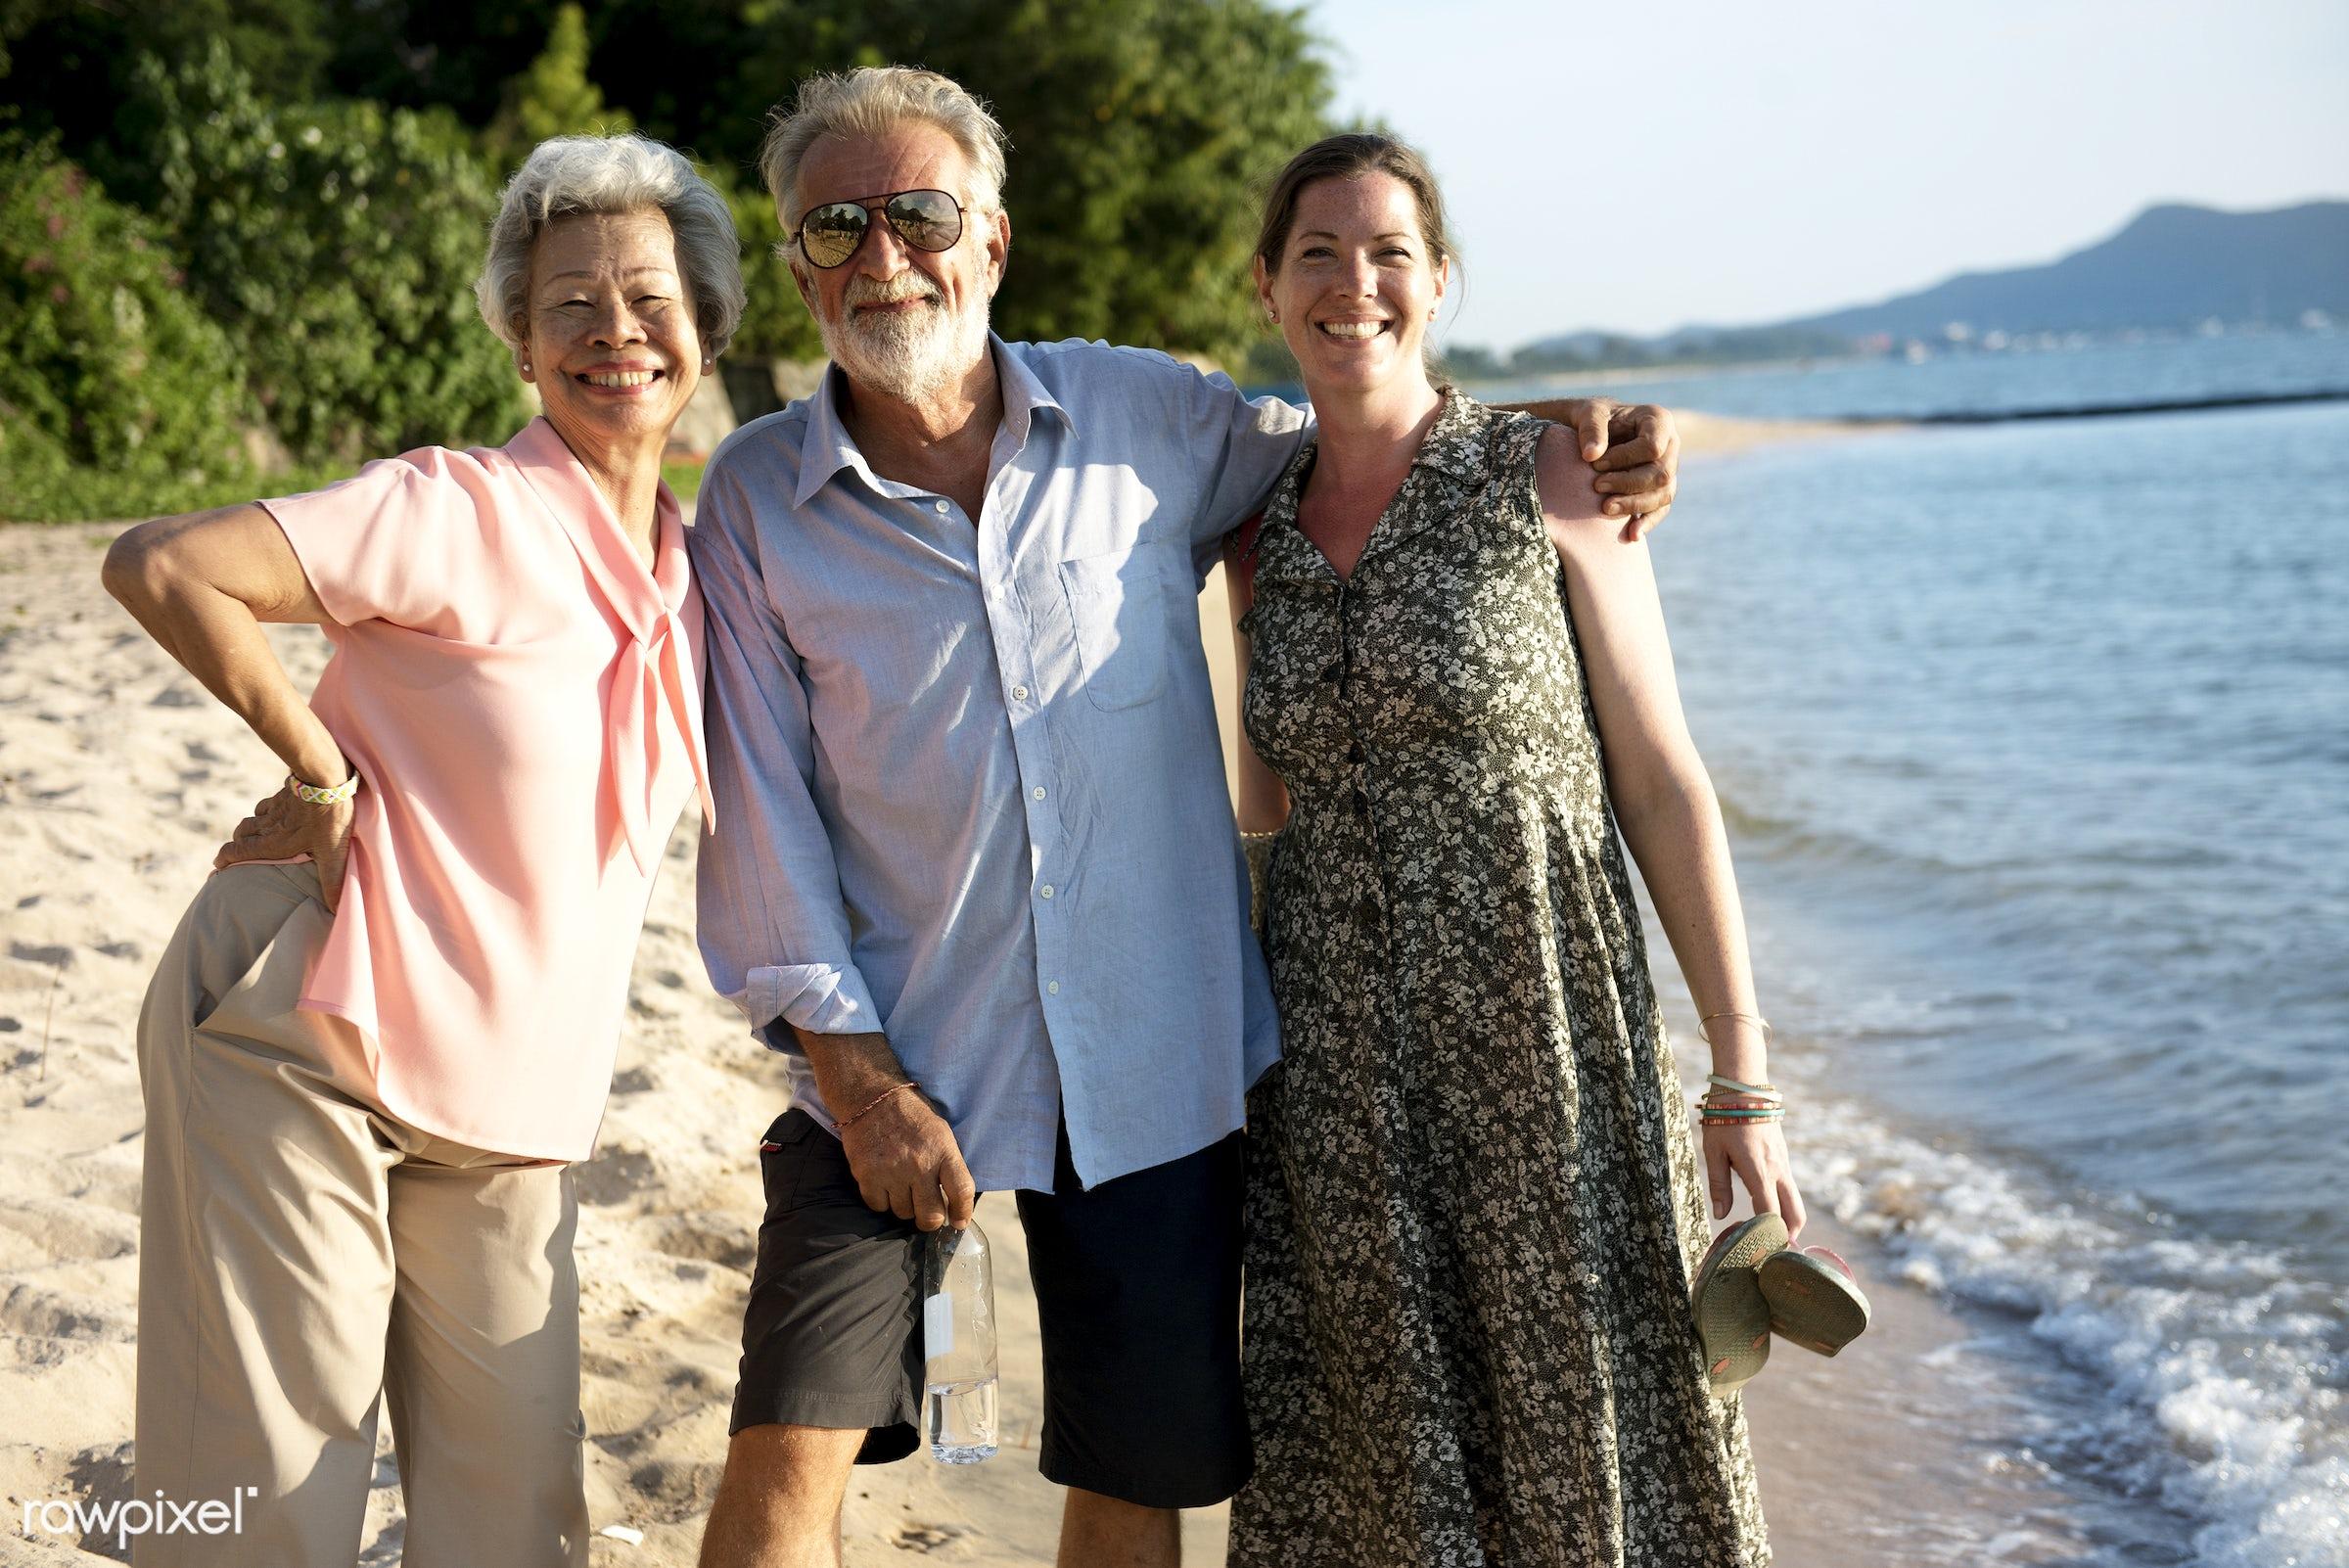 sand, diversity, sea, happiness, beach, together, coast, senior adult, enjoyment, friends, outdoors, friendship, gathering,...